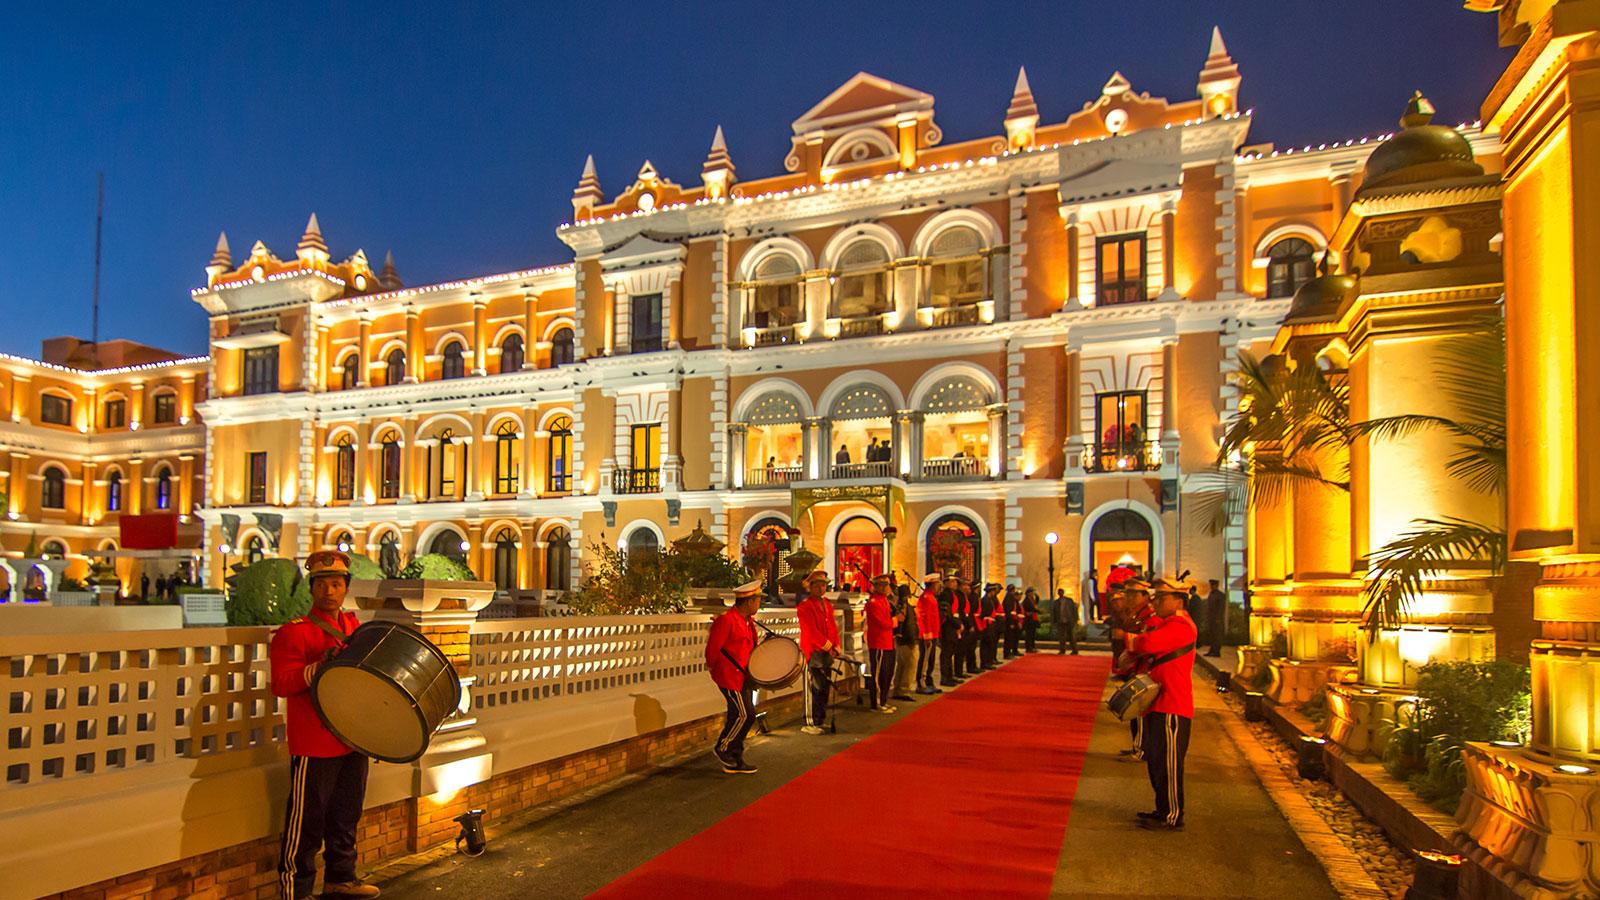 Hotel Yak Amp Yeti Luxury 5 Star Hotel In Kathmandu Nepal